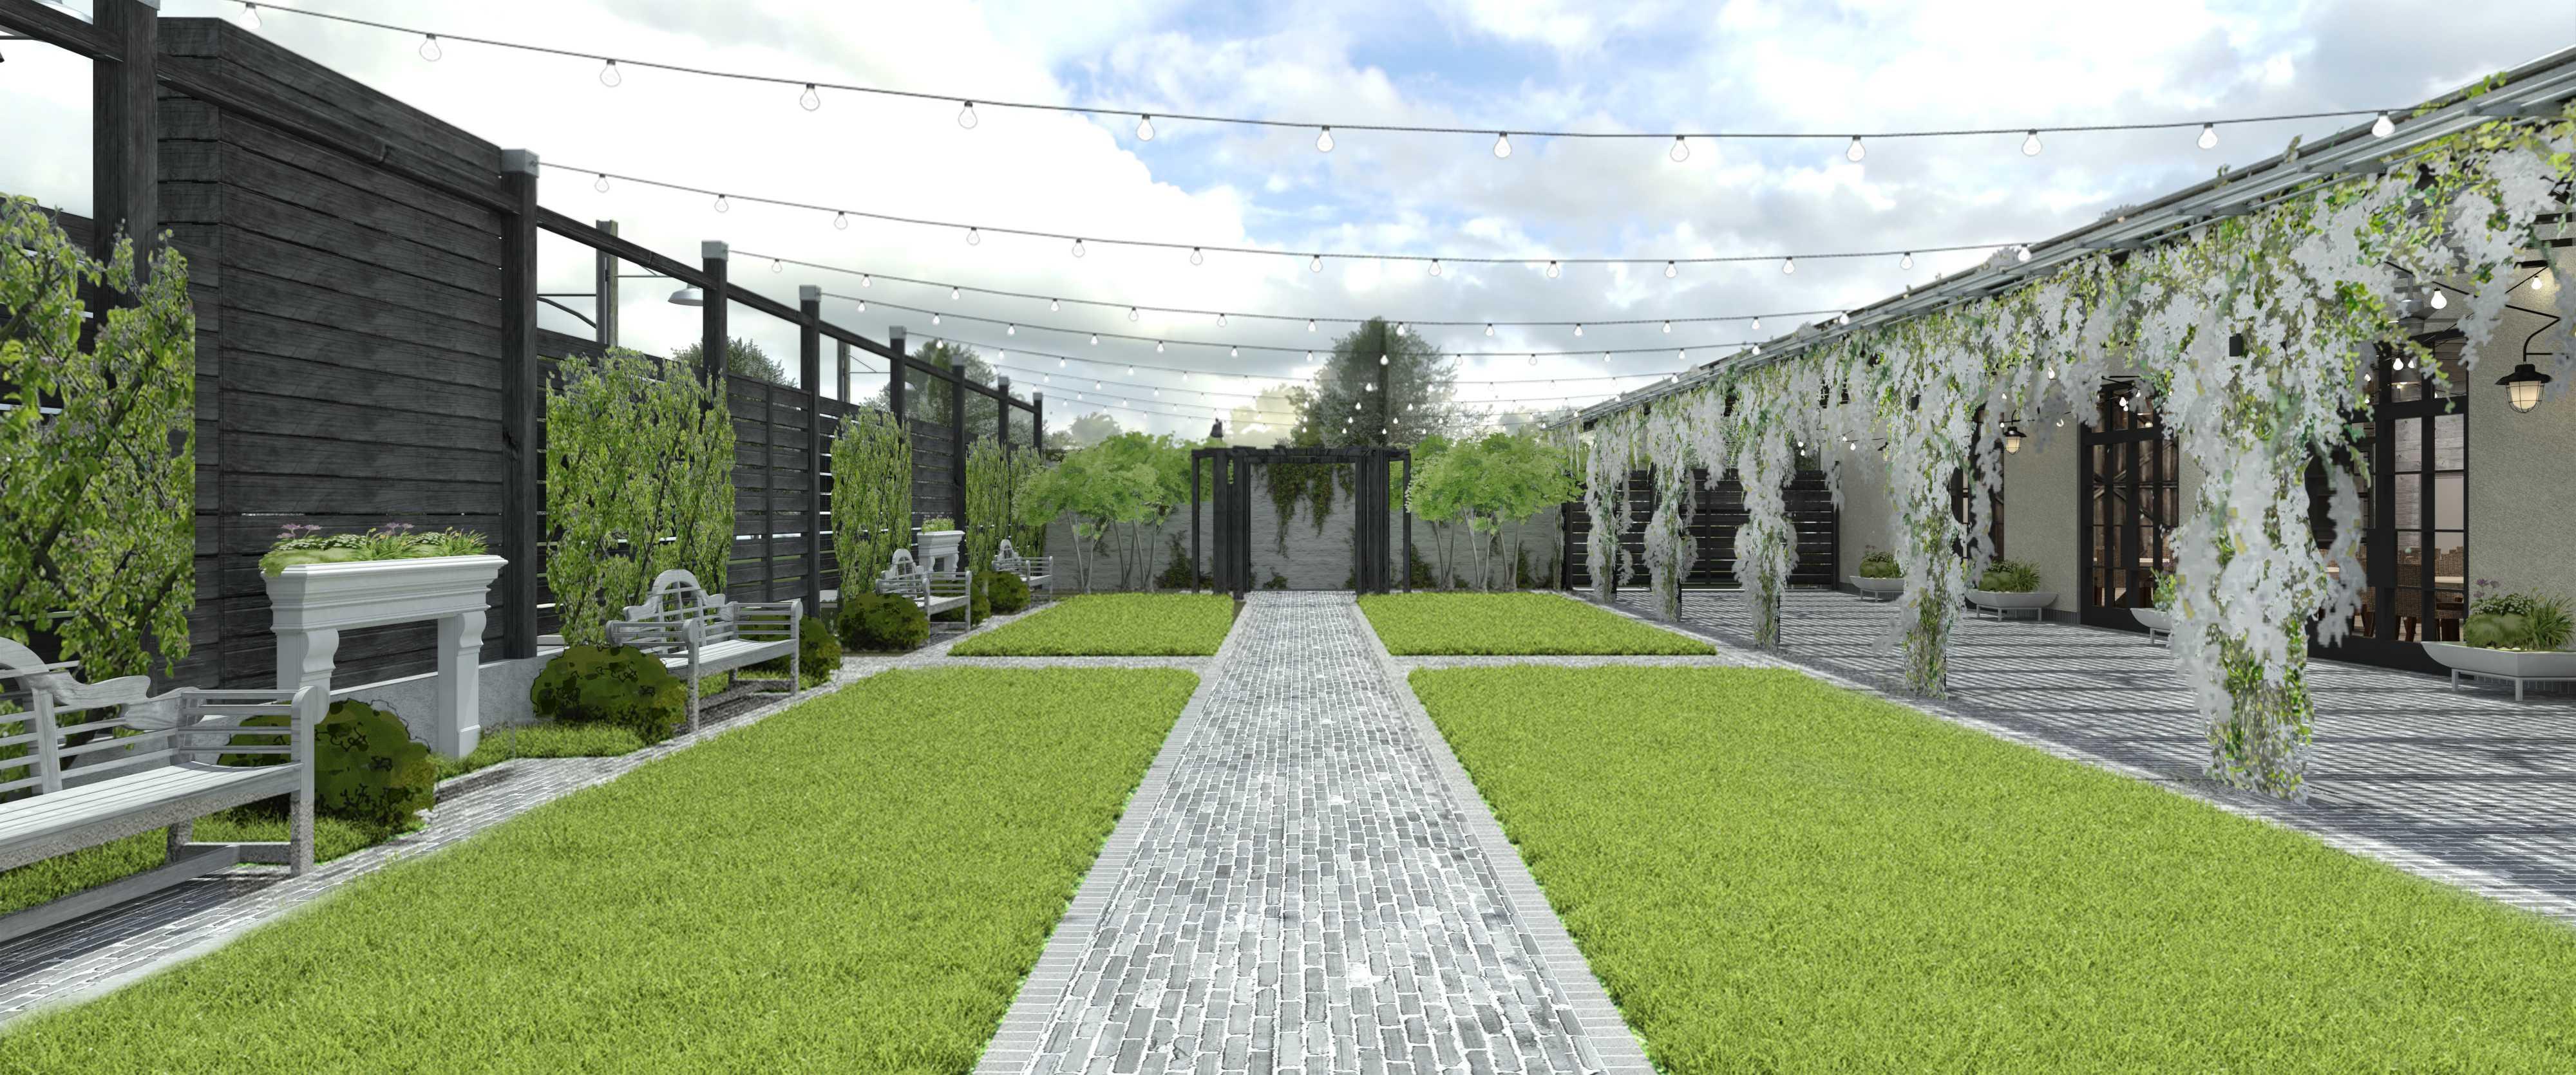 Terrain Gardens At Devon Yard Wedding Venue In Philadelphia Partyspace